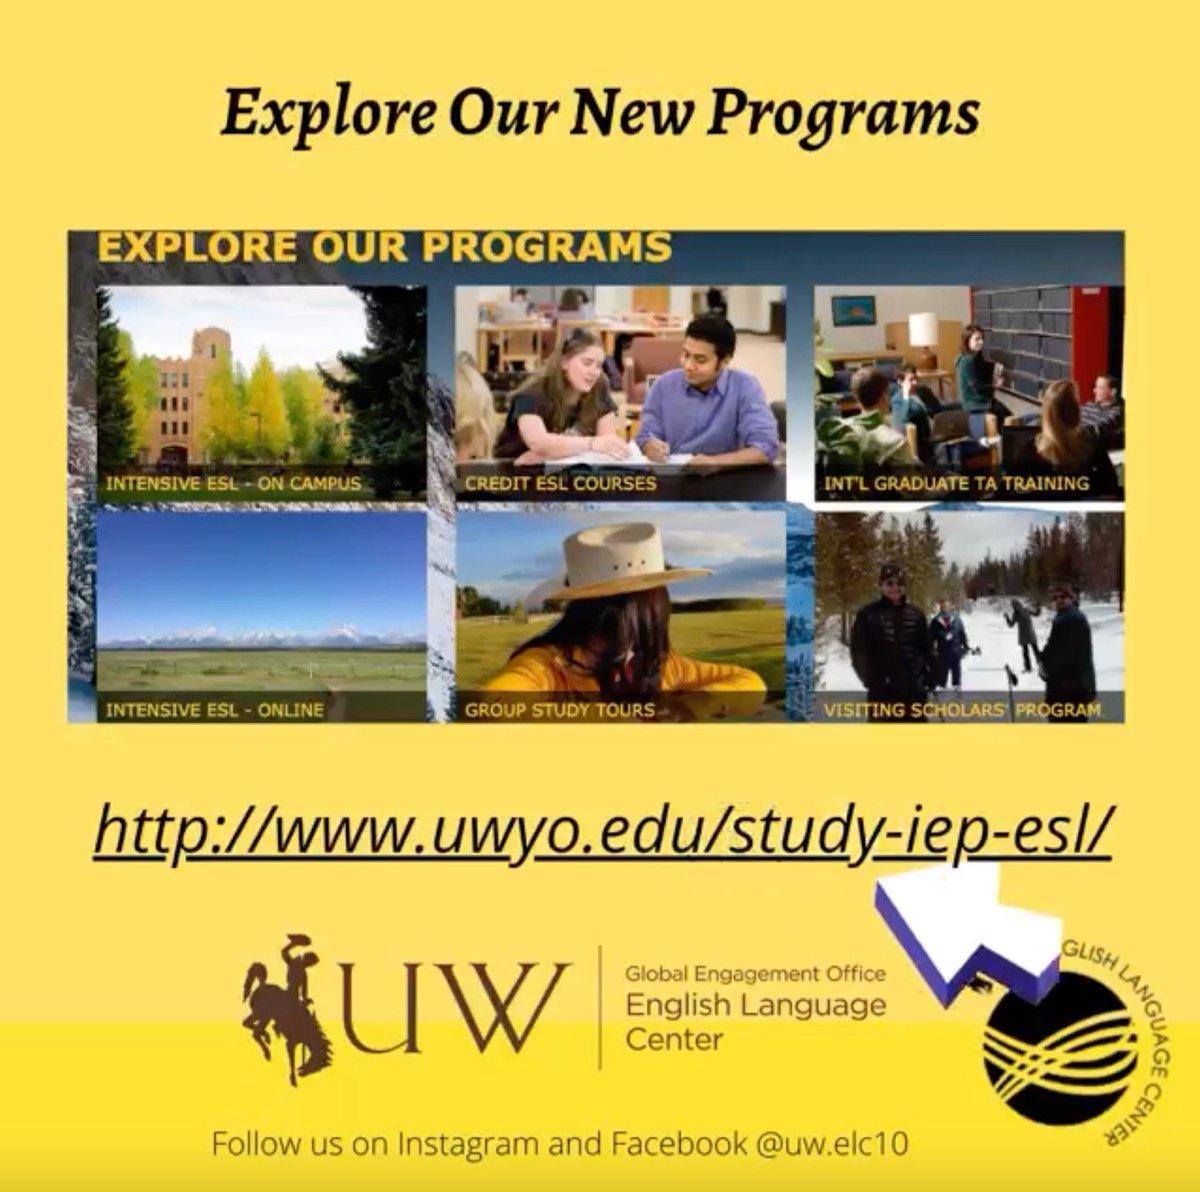 Explore the English Language Center's New Programs  University of Wyoming #ESL #IEP #Trainings  #UW #English #ESL